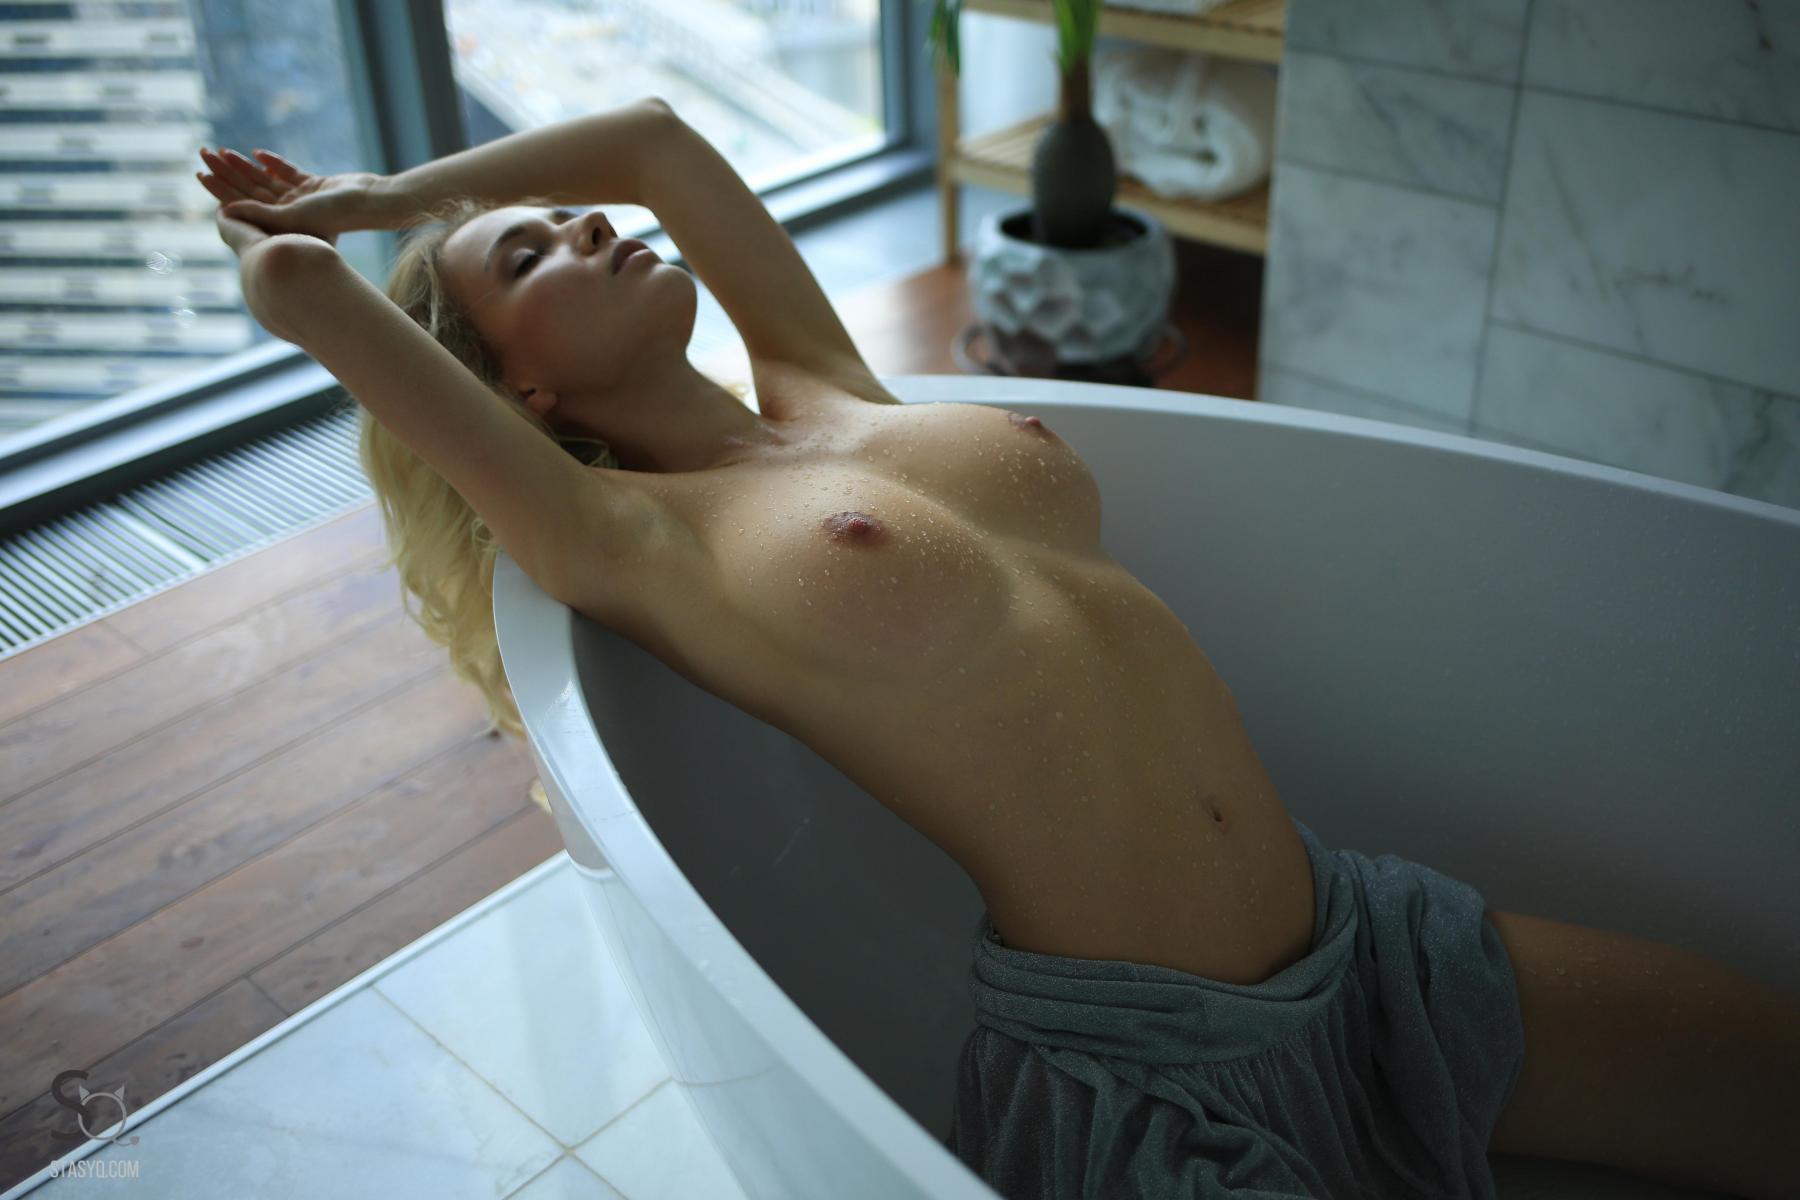 monroq-blonde-boobs-naked-bathroom-window-stasyq-15